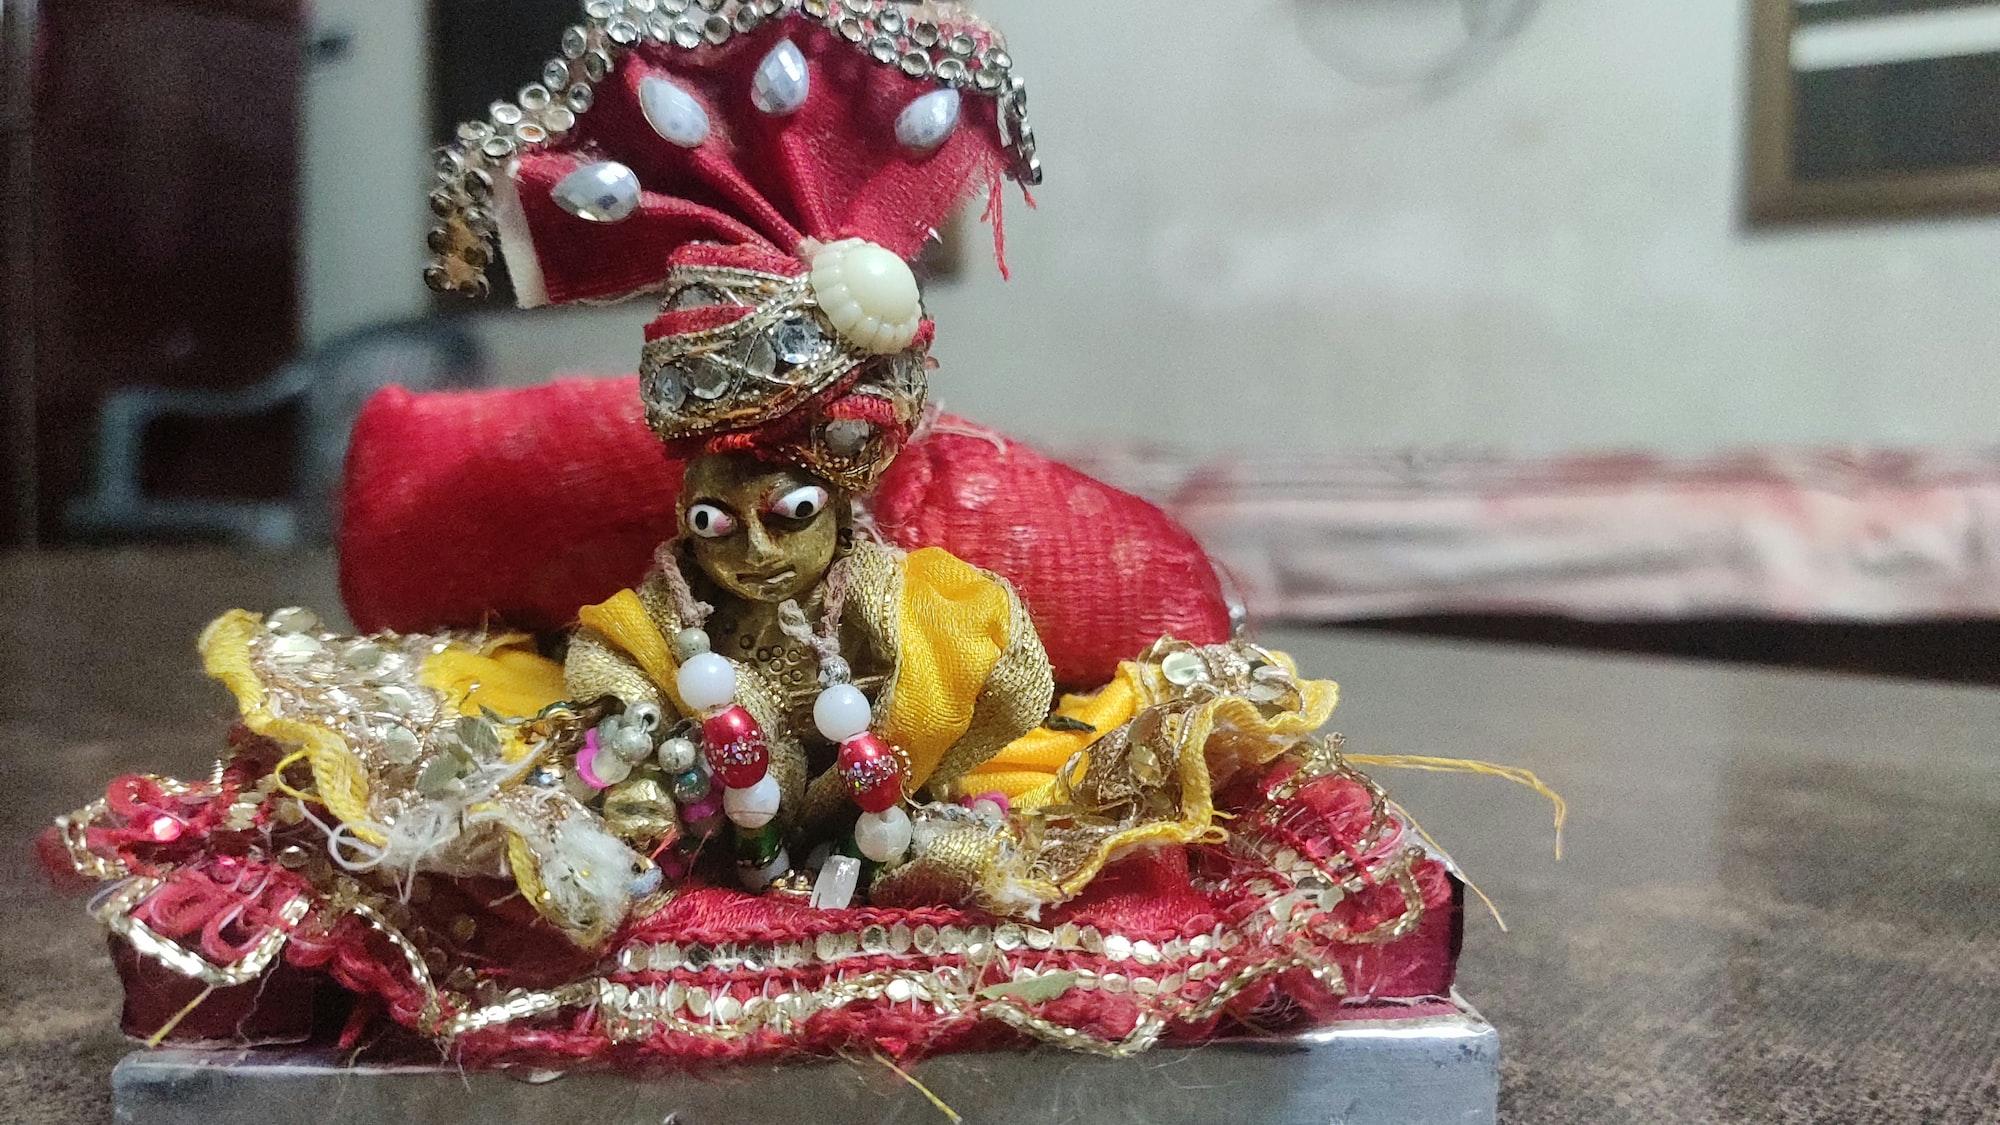 Lord Krishna blessing us on the auspicious occasion of Janmashtmi(His birthday)